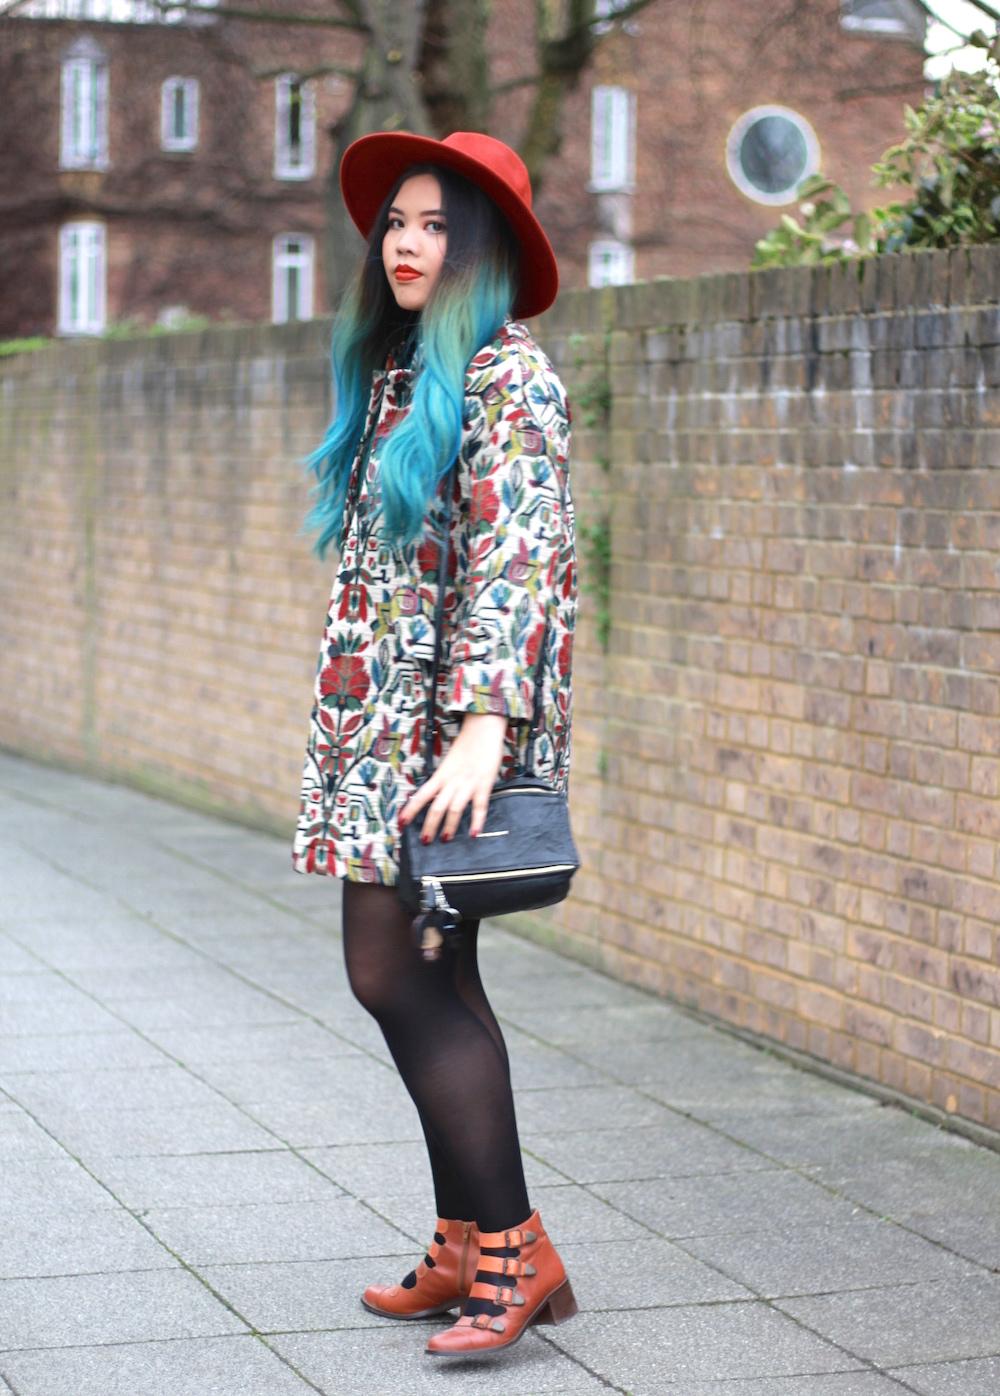 fe247a6b Zara coat / Zara dress / Catarzi hat / Topshop shoes / Givenchy bag /  Limecrime Velvetine in Pumpkin